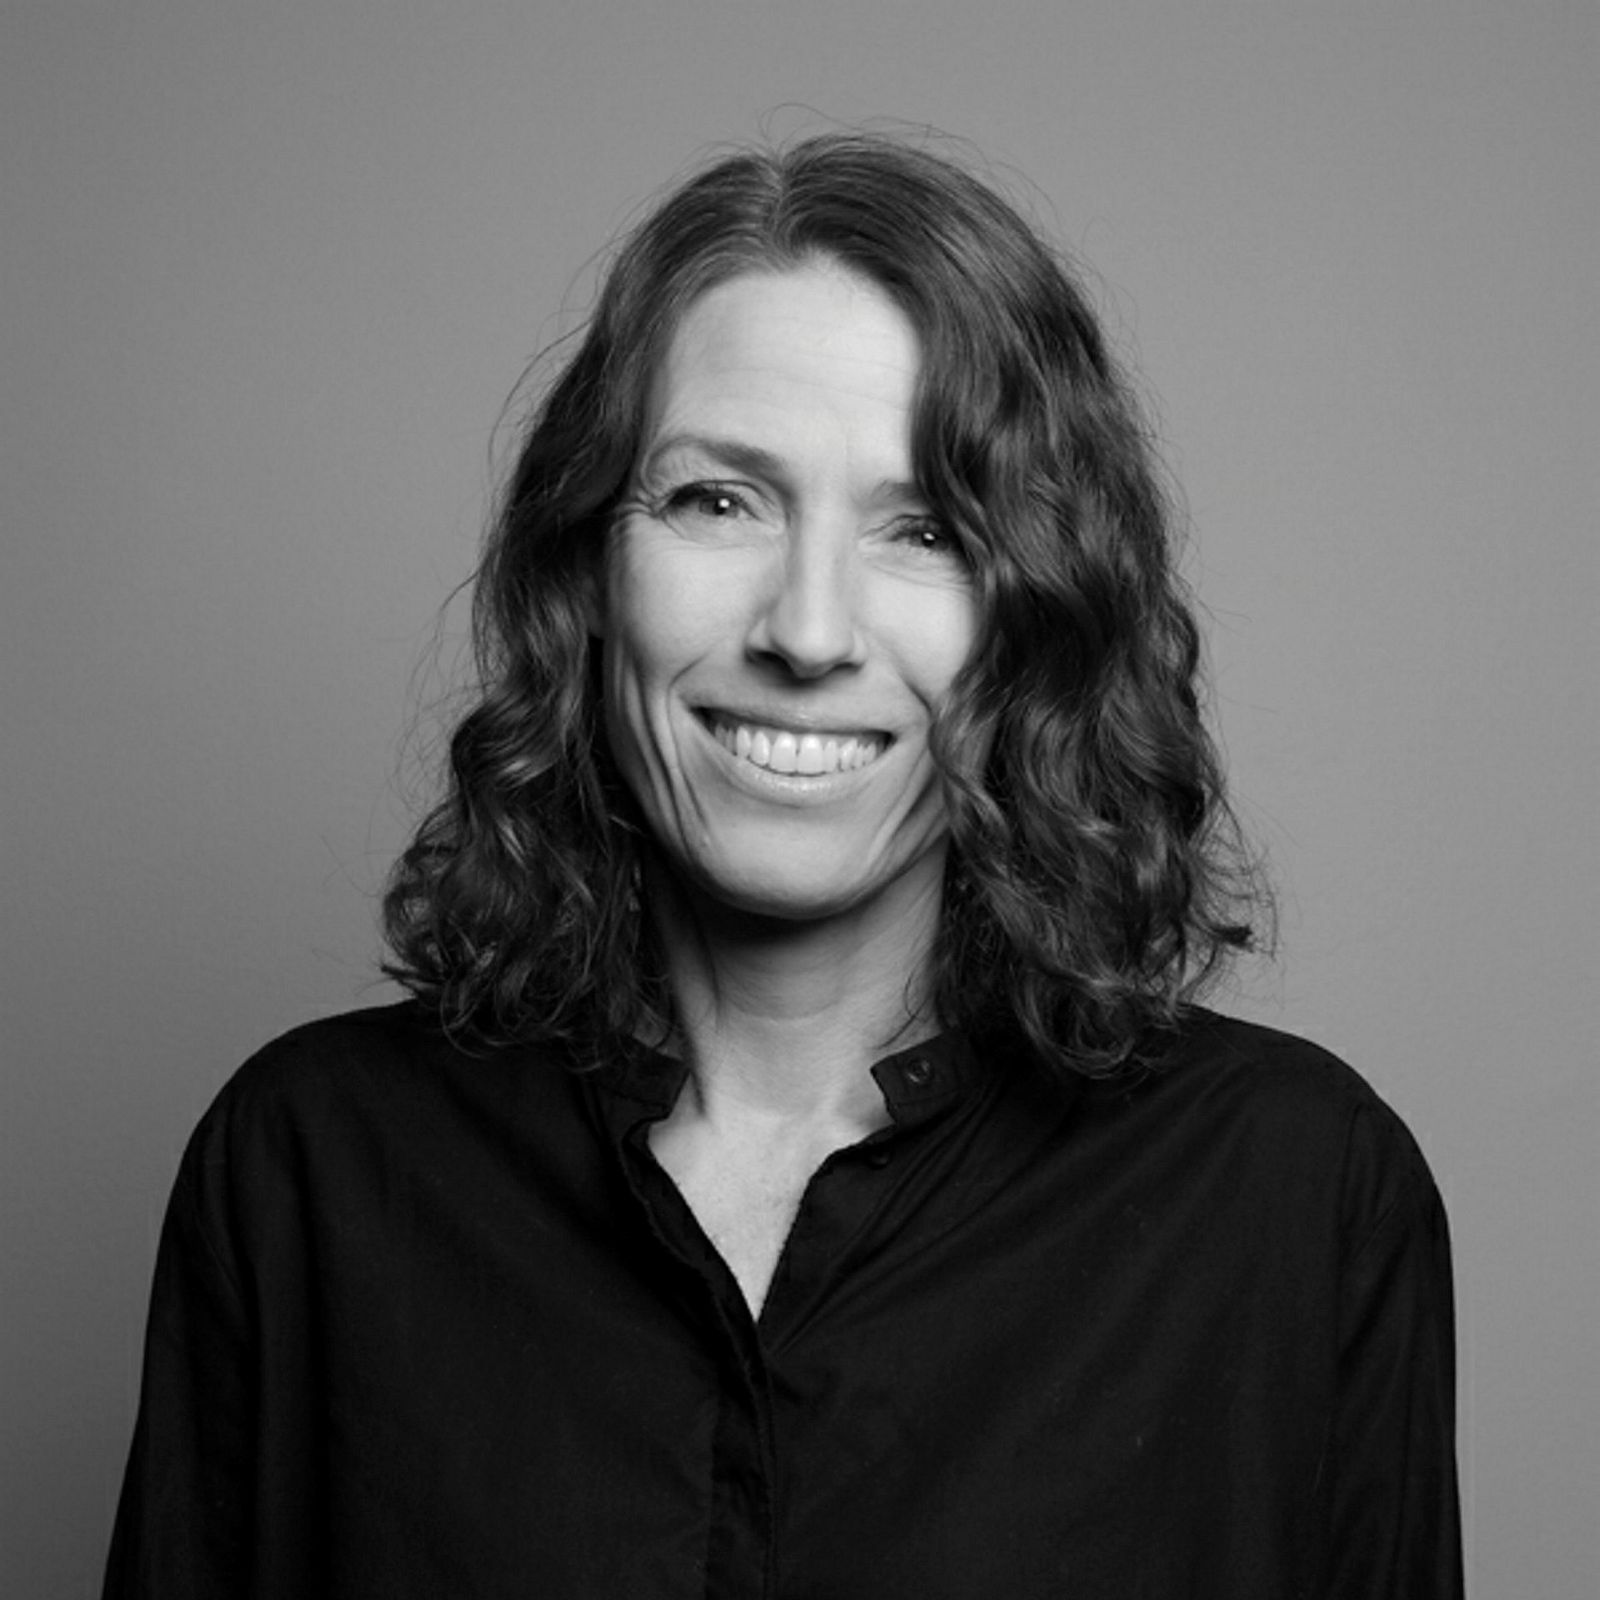 Tv- og videosjef Marianne Massaiu i mediebyrået Mediacom